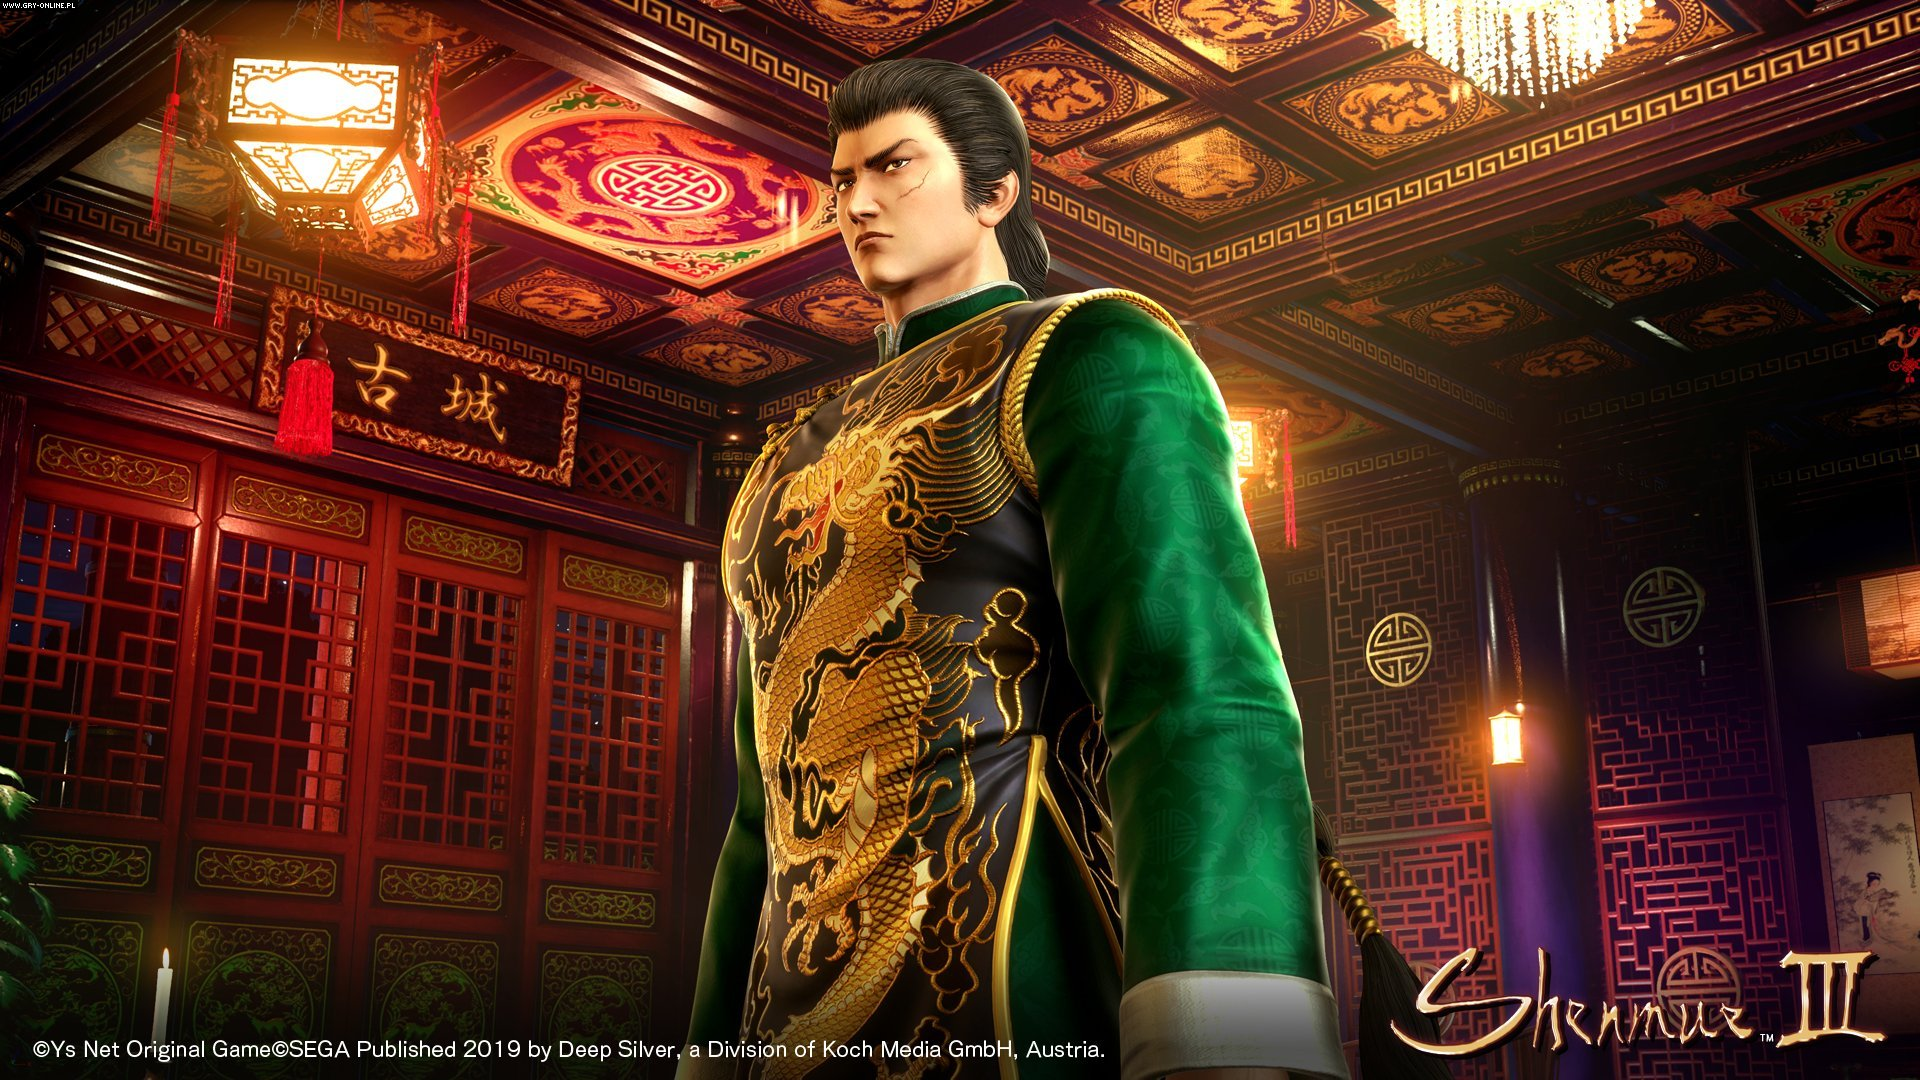 Shenmue III PC, PS4 Games Image 6/41, Ys Net, Deep Silver / Koch Media